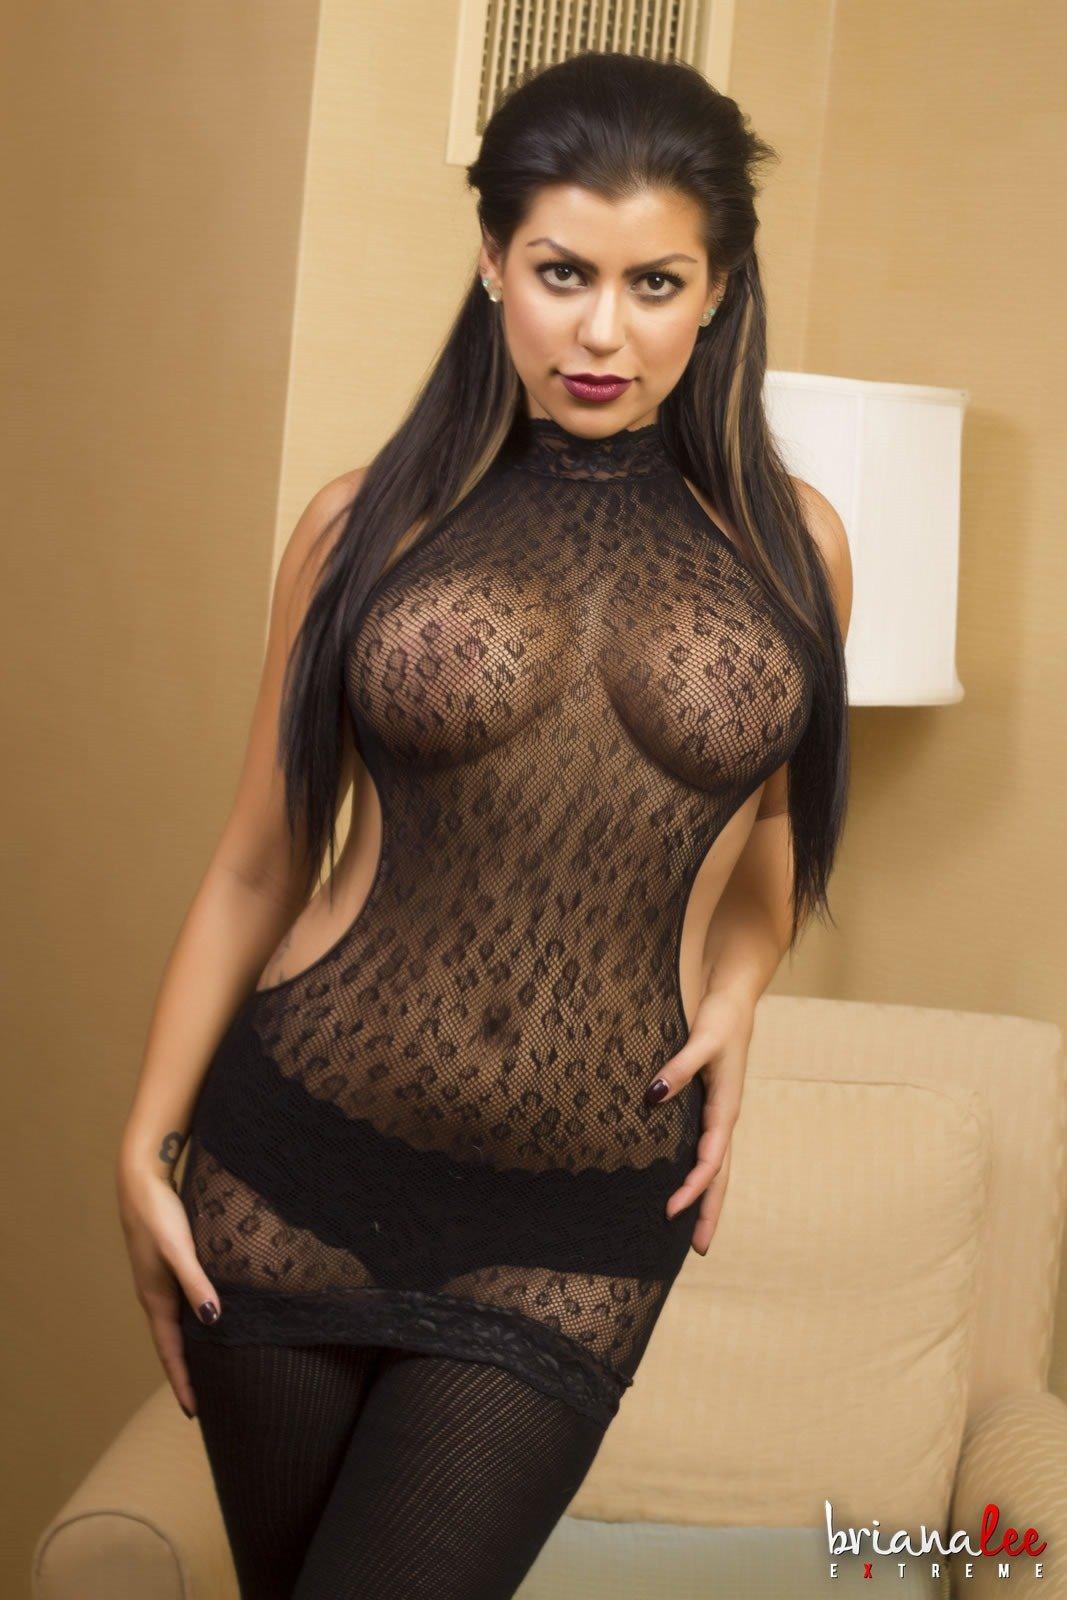 Briana lee hd Briana Lee Extreme Sexy Teen Stockings